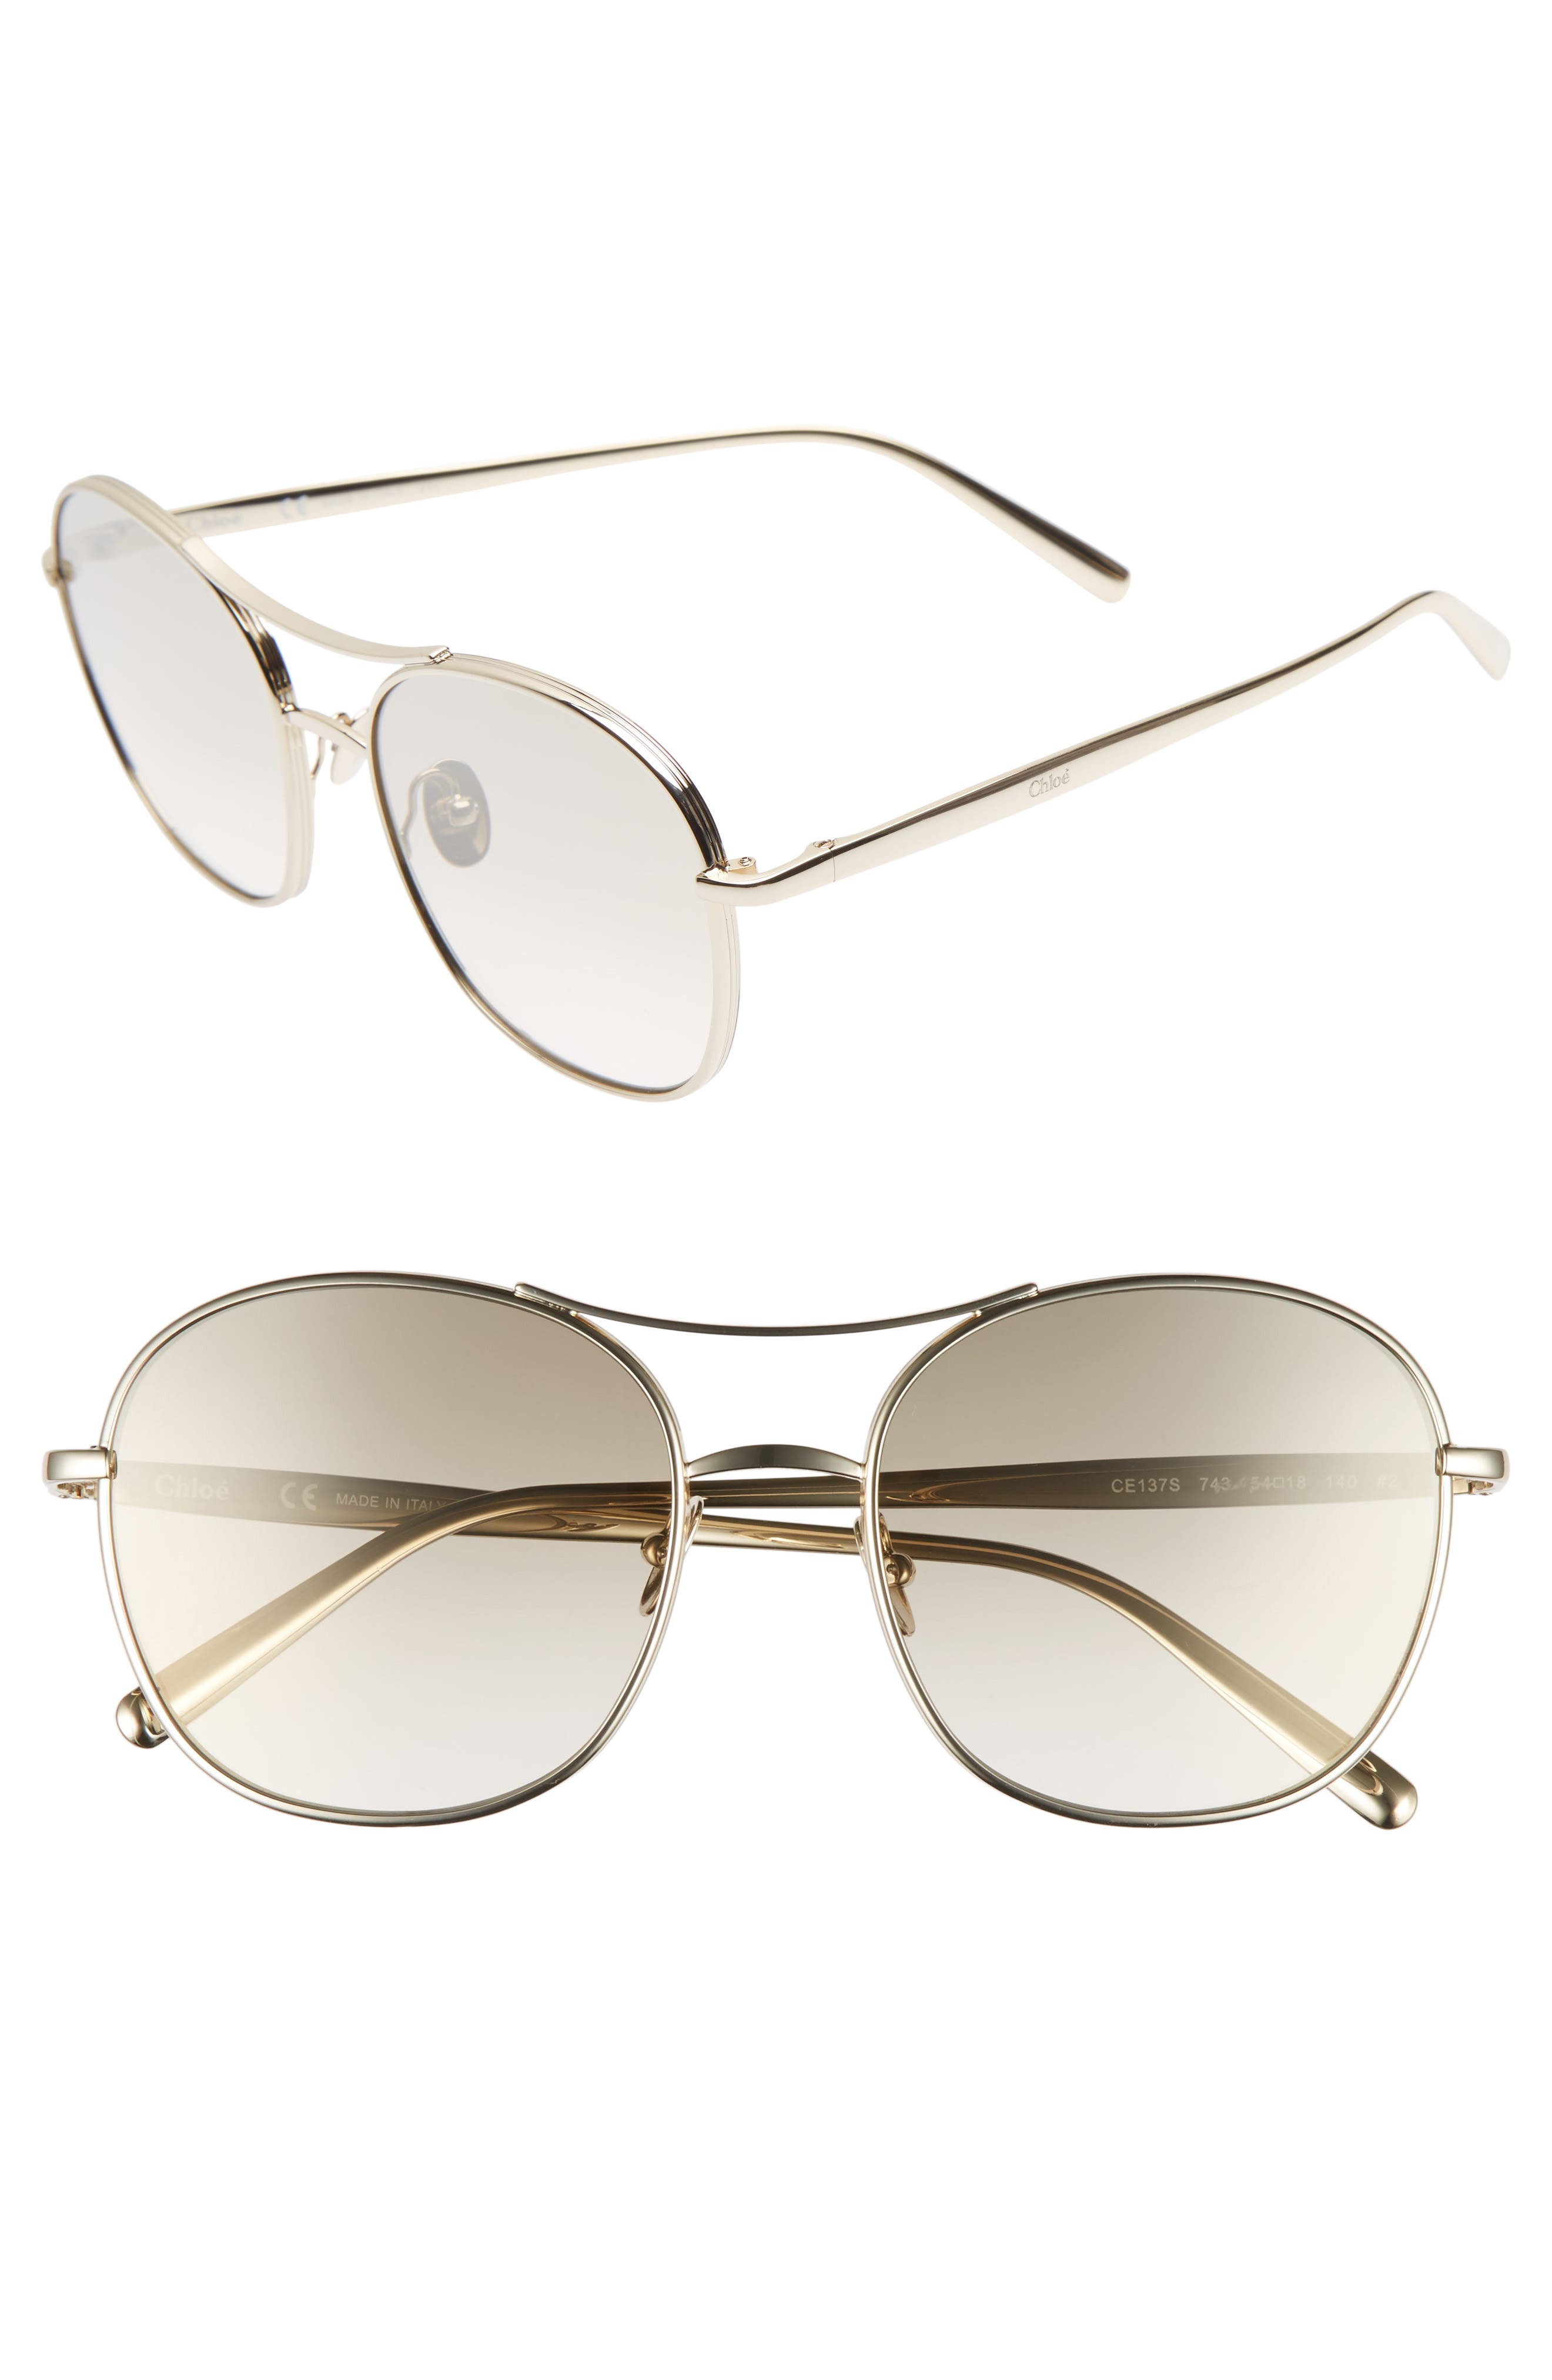 54mm Aviator Sunglasses,                         Main,                         color, Gold/ Brown